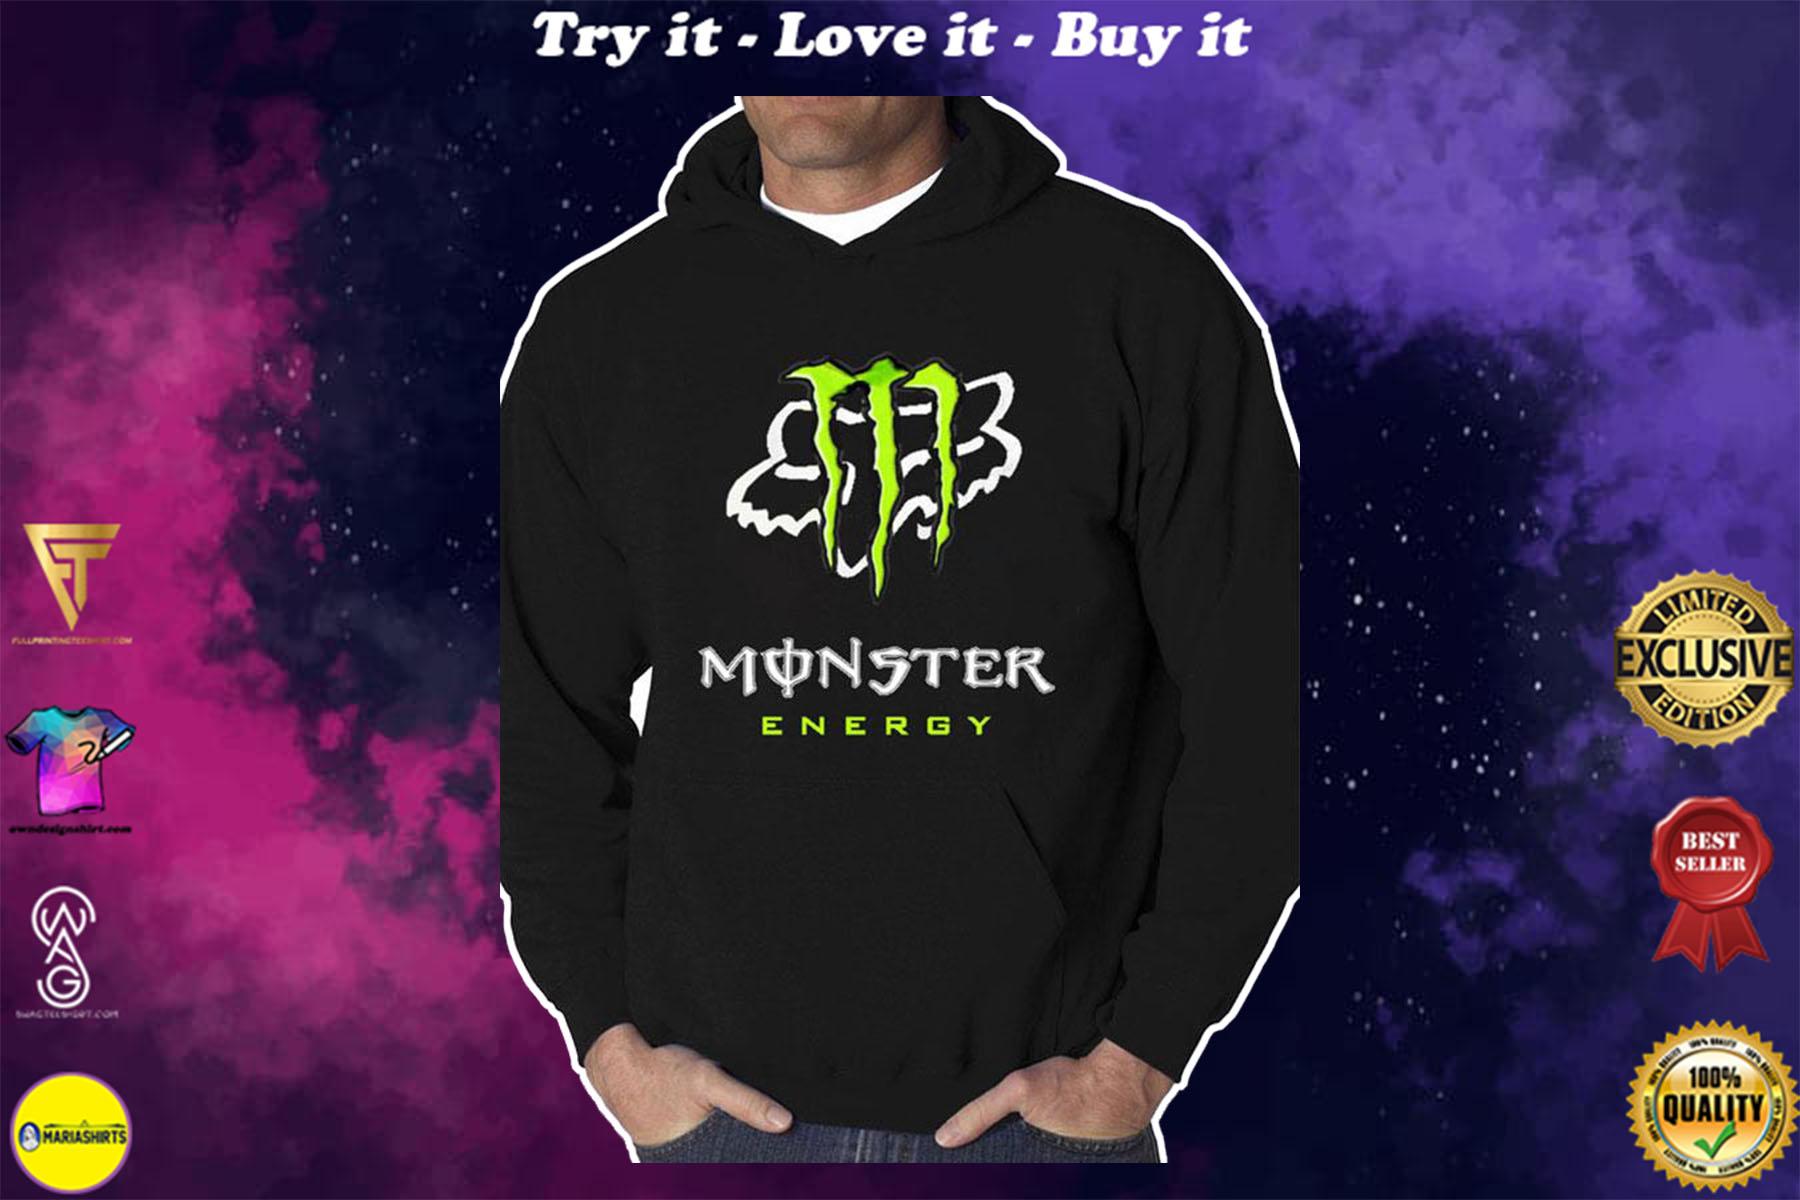 [special edition] monster energy fox racing team motocross full printing shirt - maria